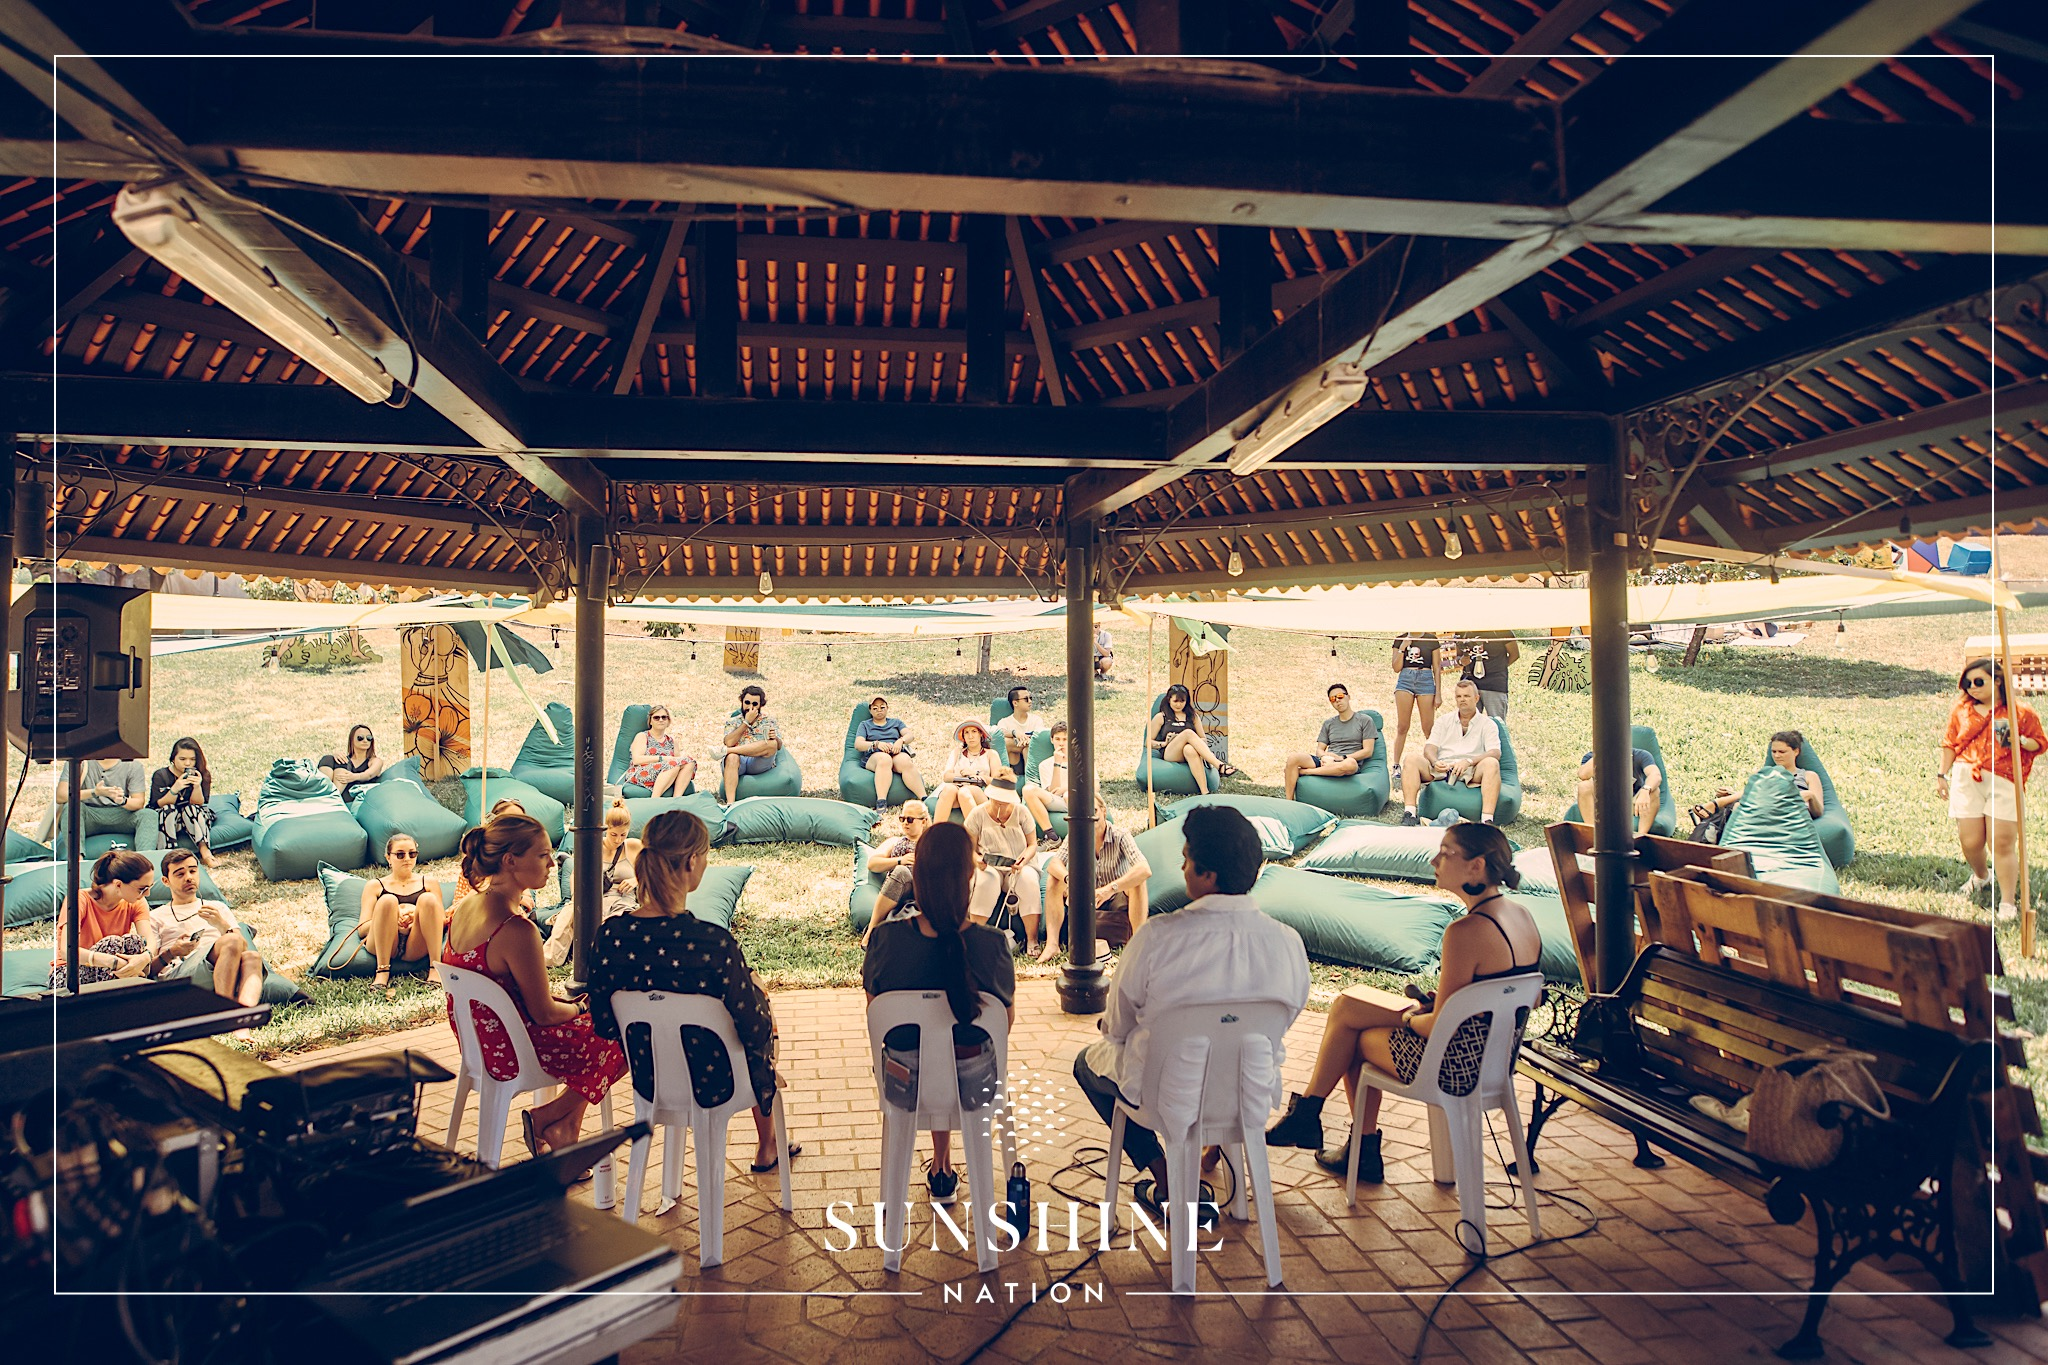 09032019_SunshineNation_Colossal029_Watermarked.jpg